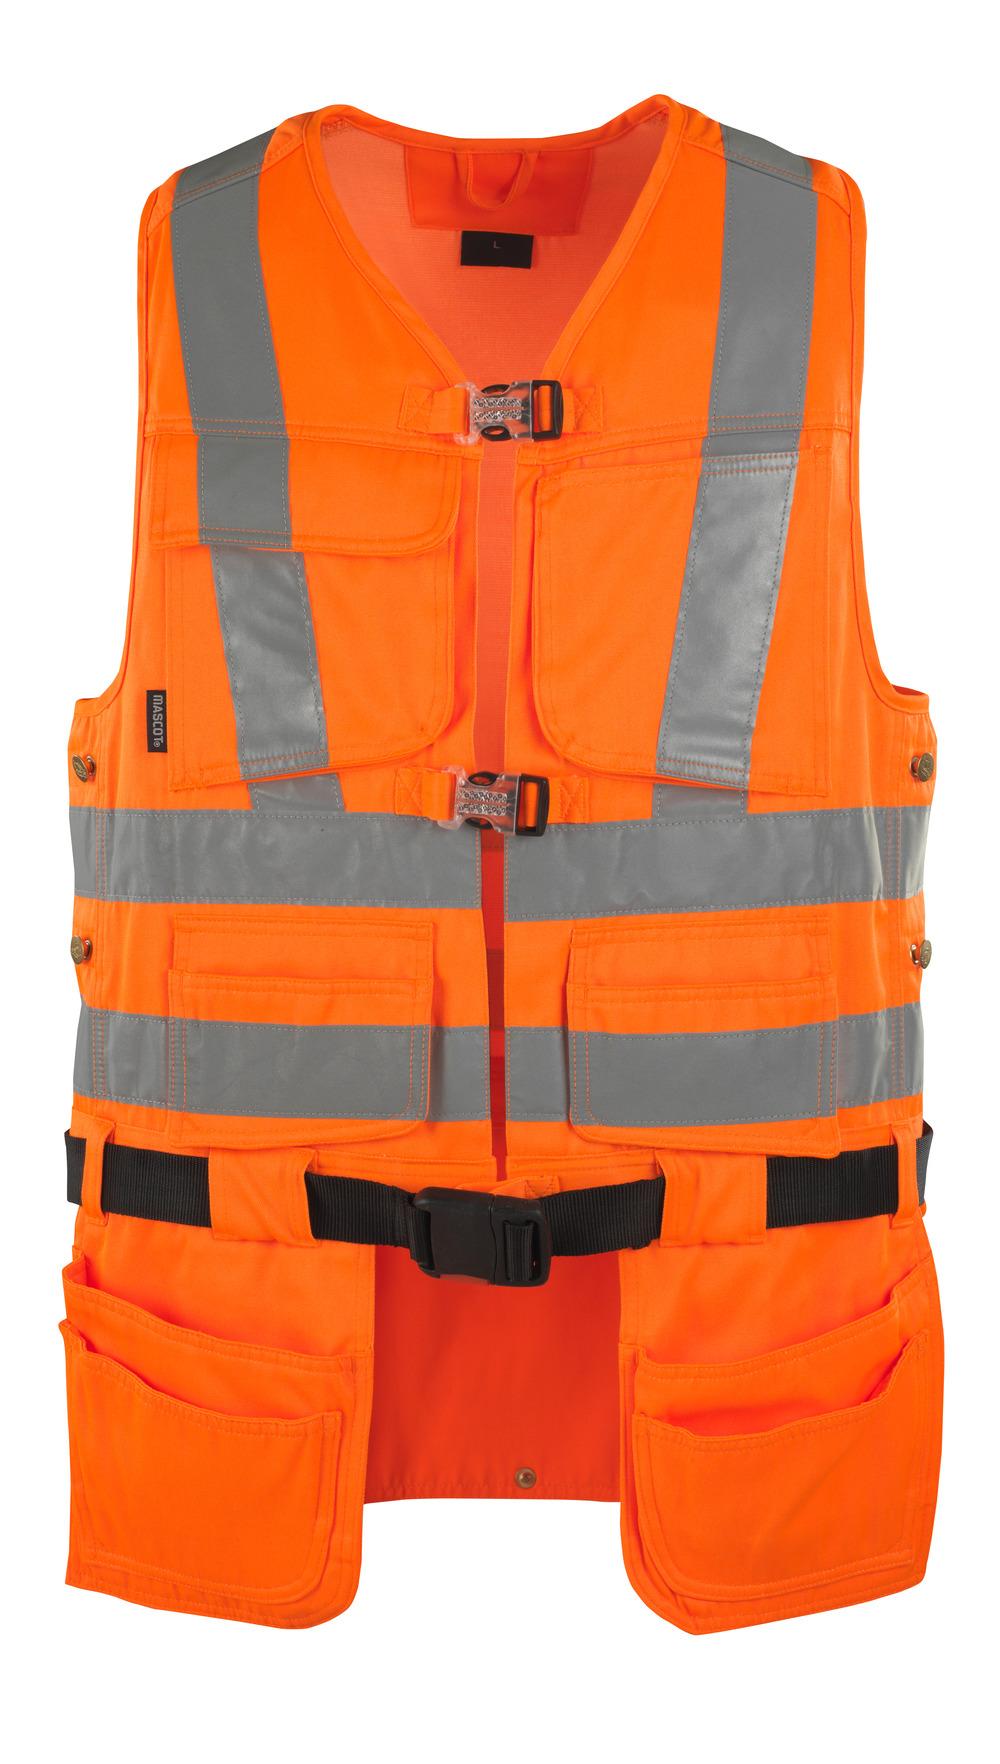 08089-860-14 Tool Vest - hi-vis orange